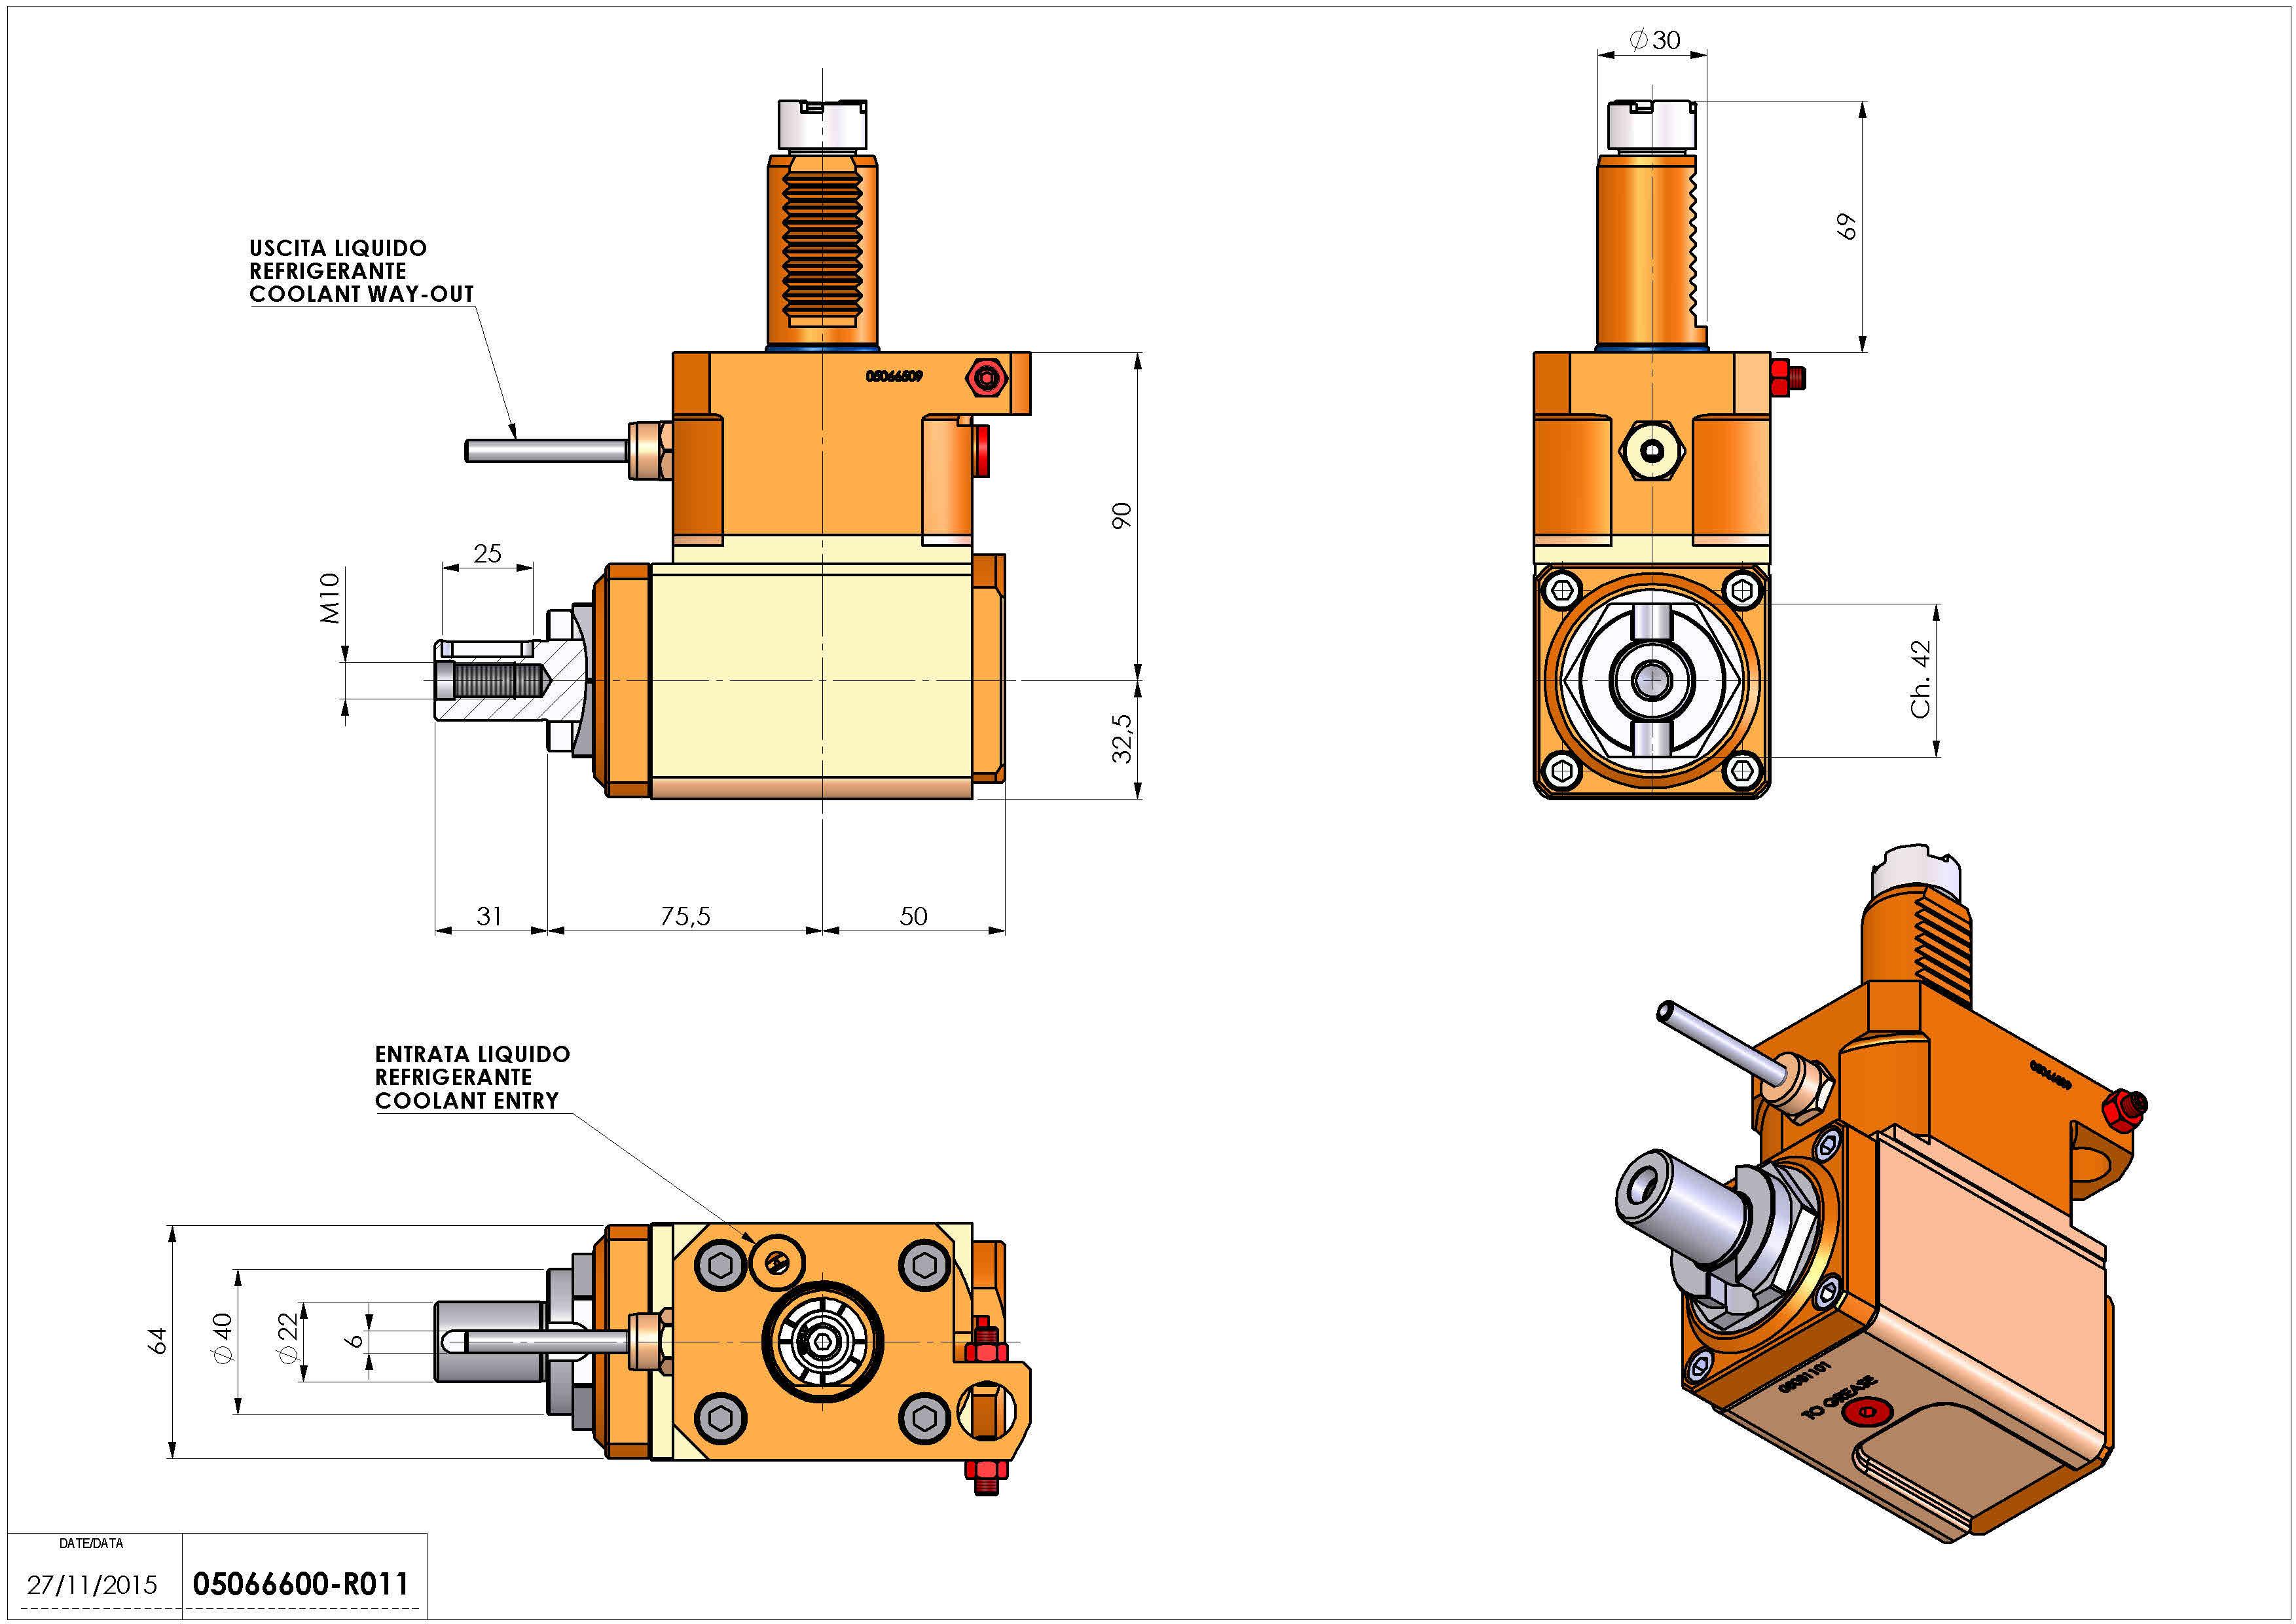 Technical image - LT-A VDI30 DIN138-22 R H90 OK.